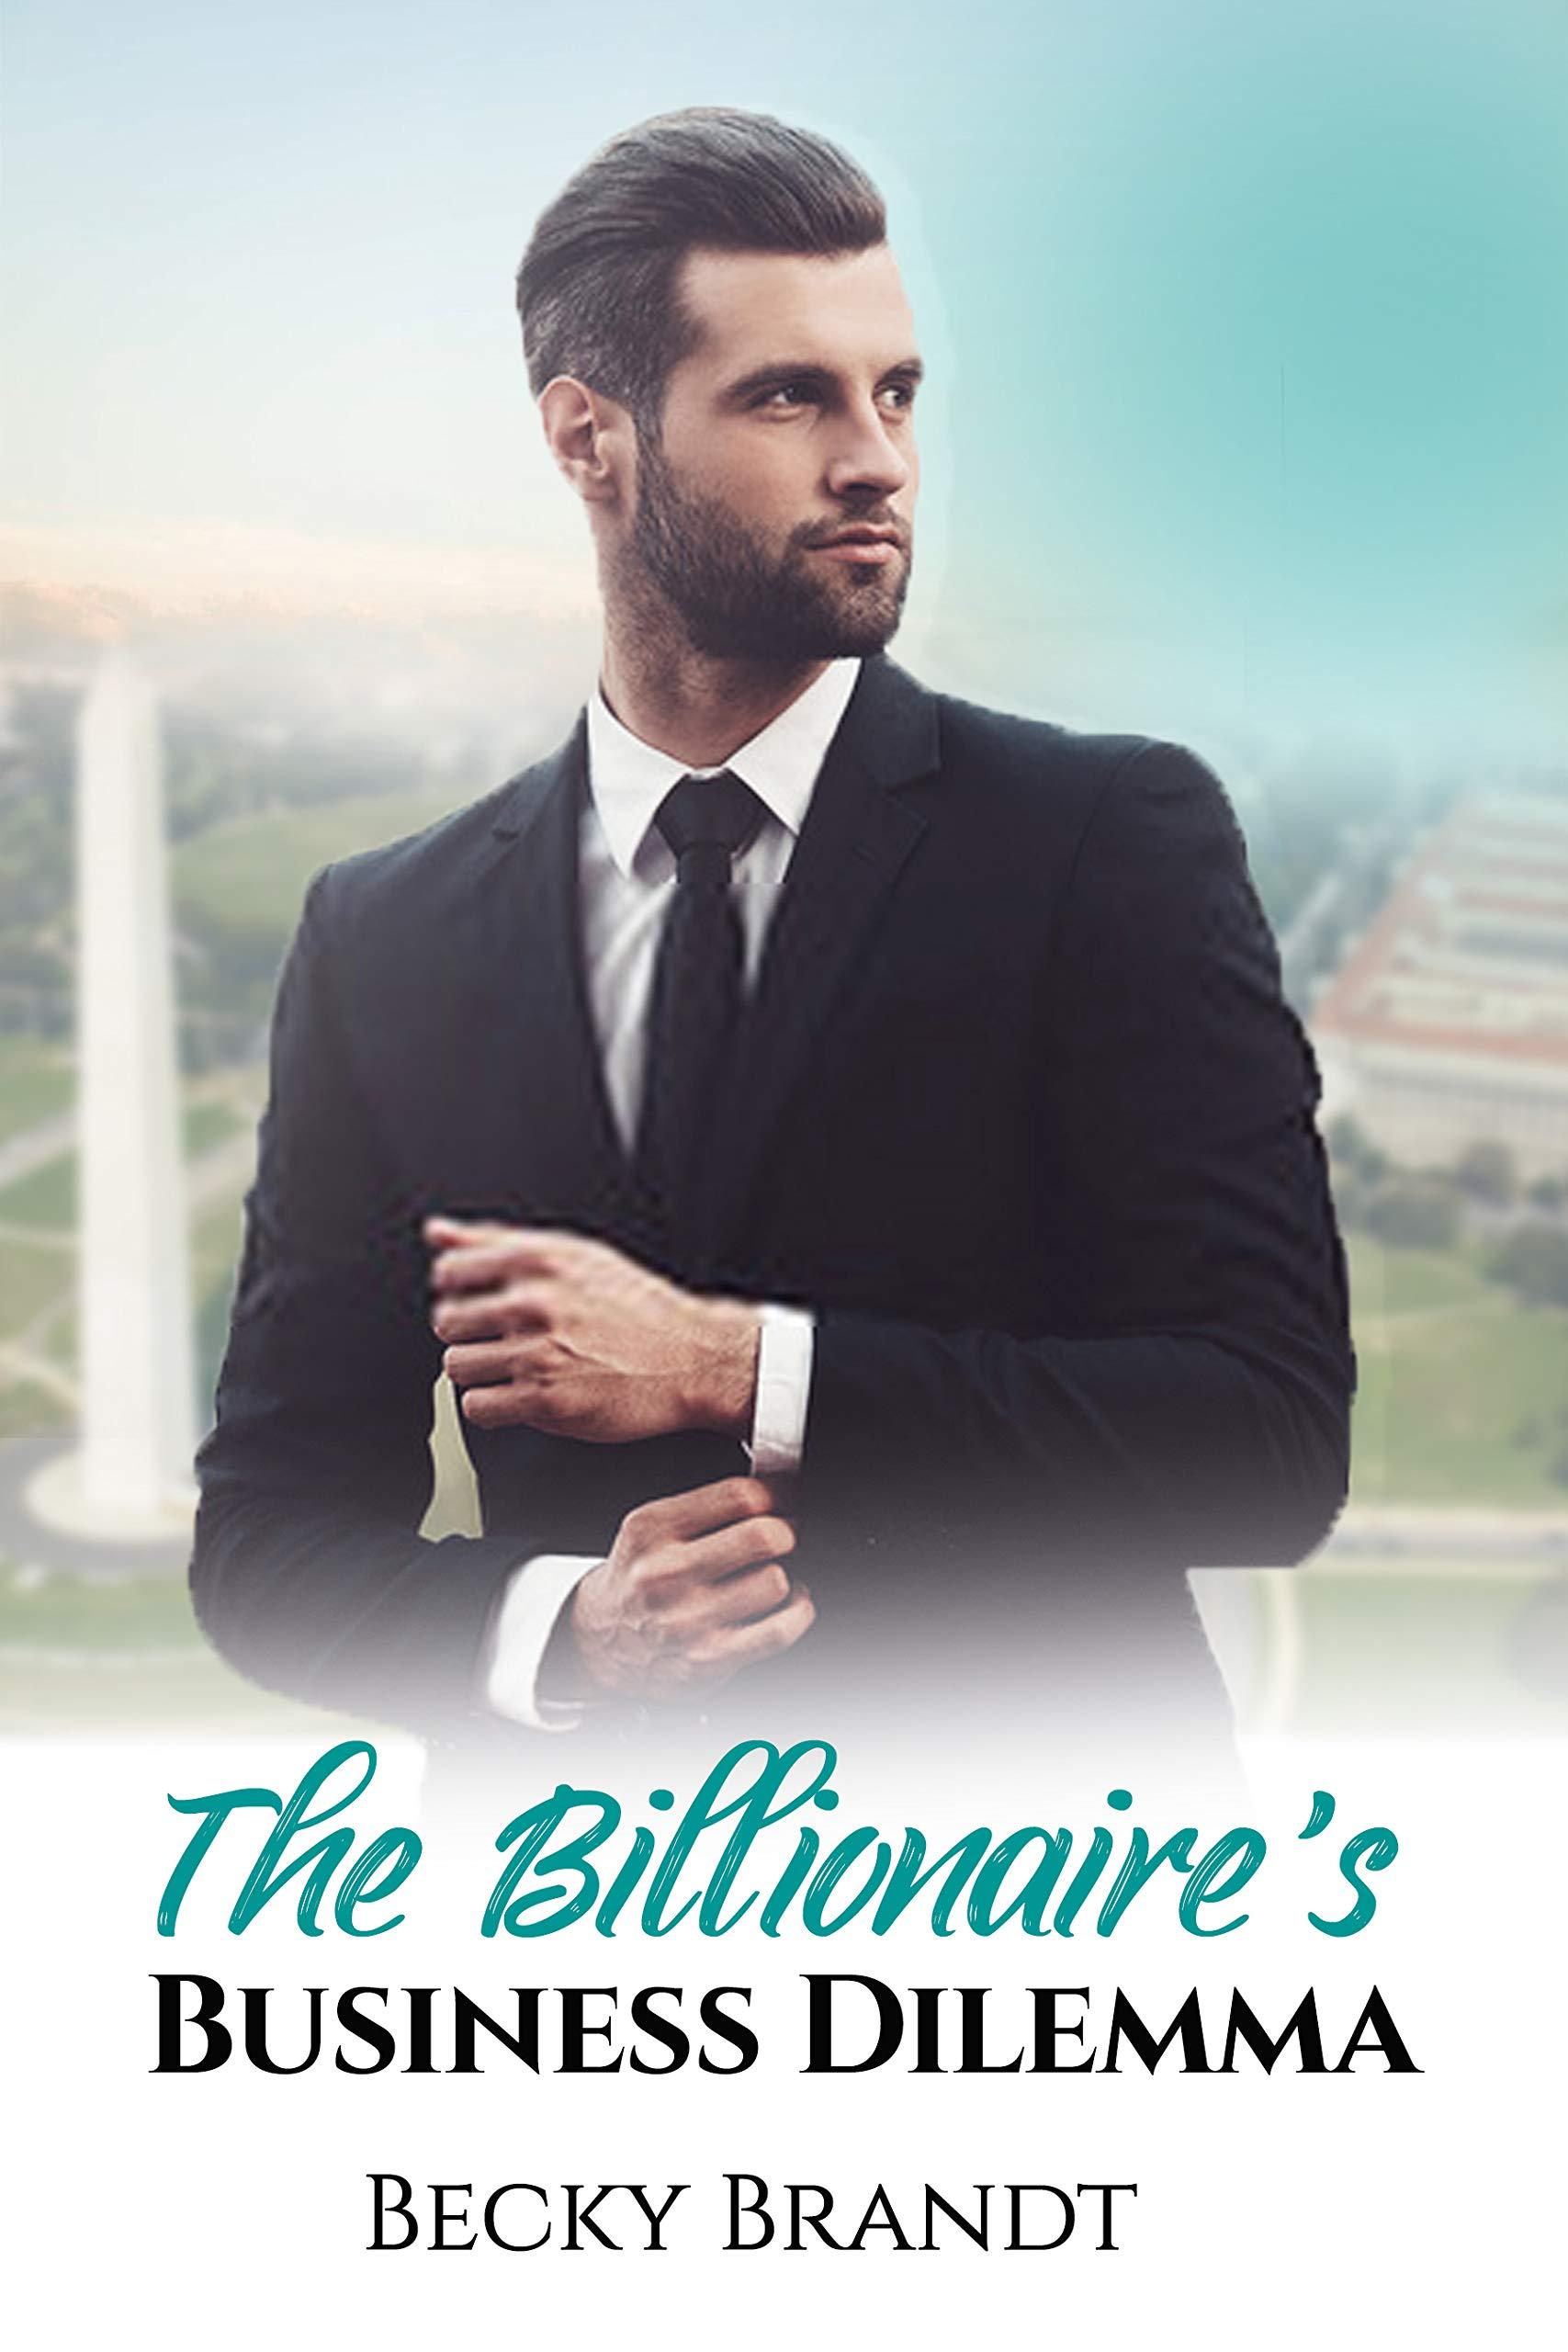 The Billionaire's Business Dilemma